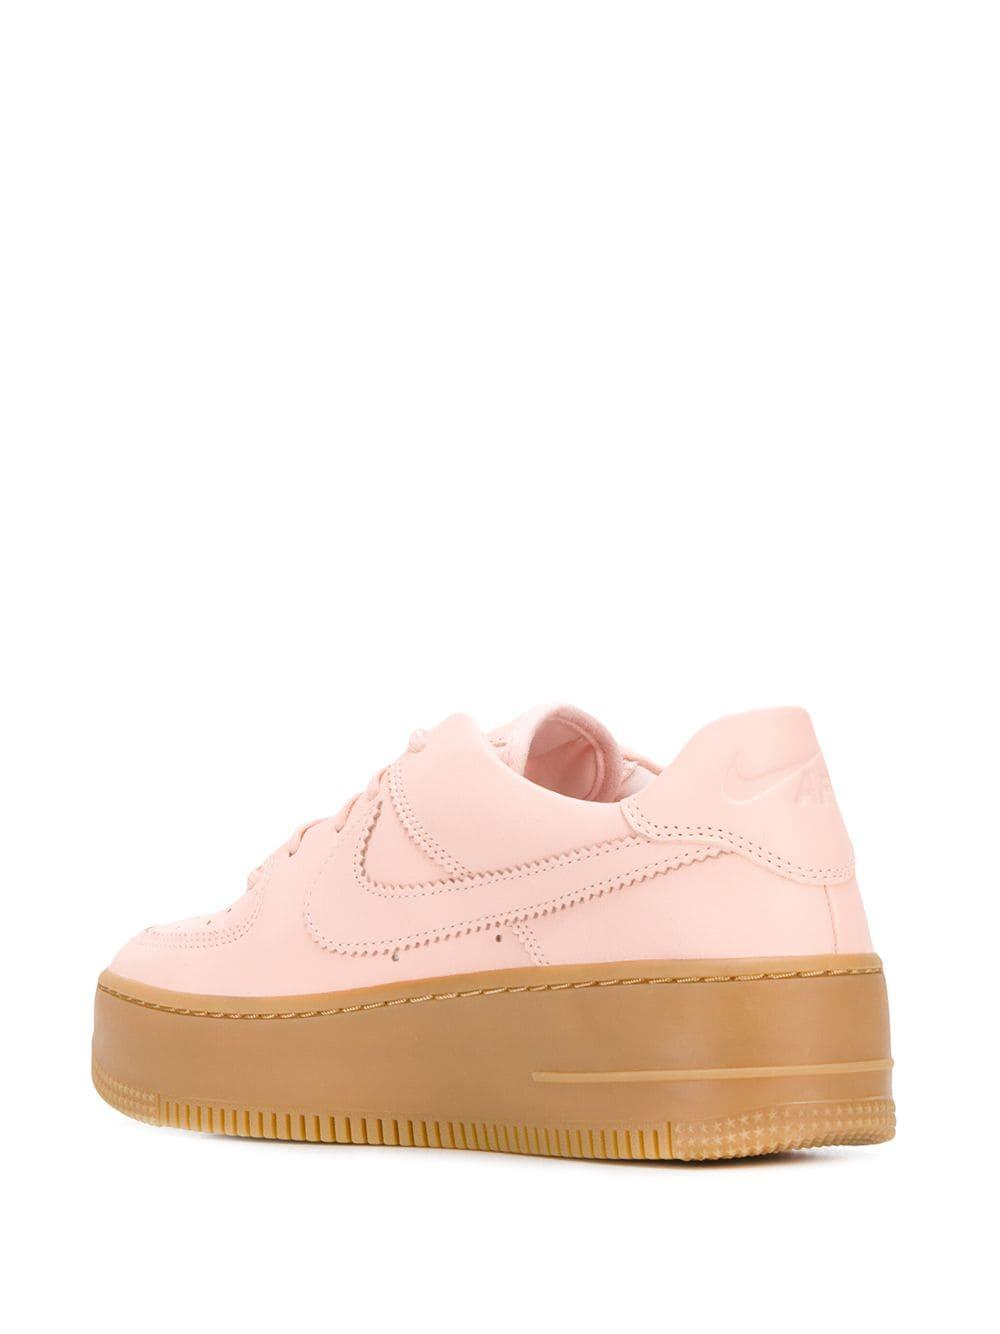 nike air force sage low pink